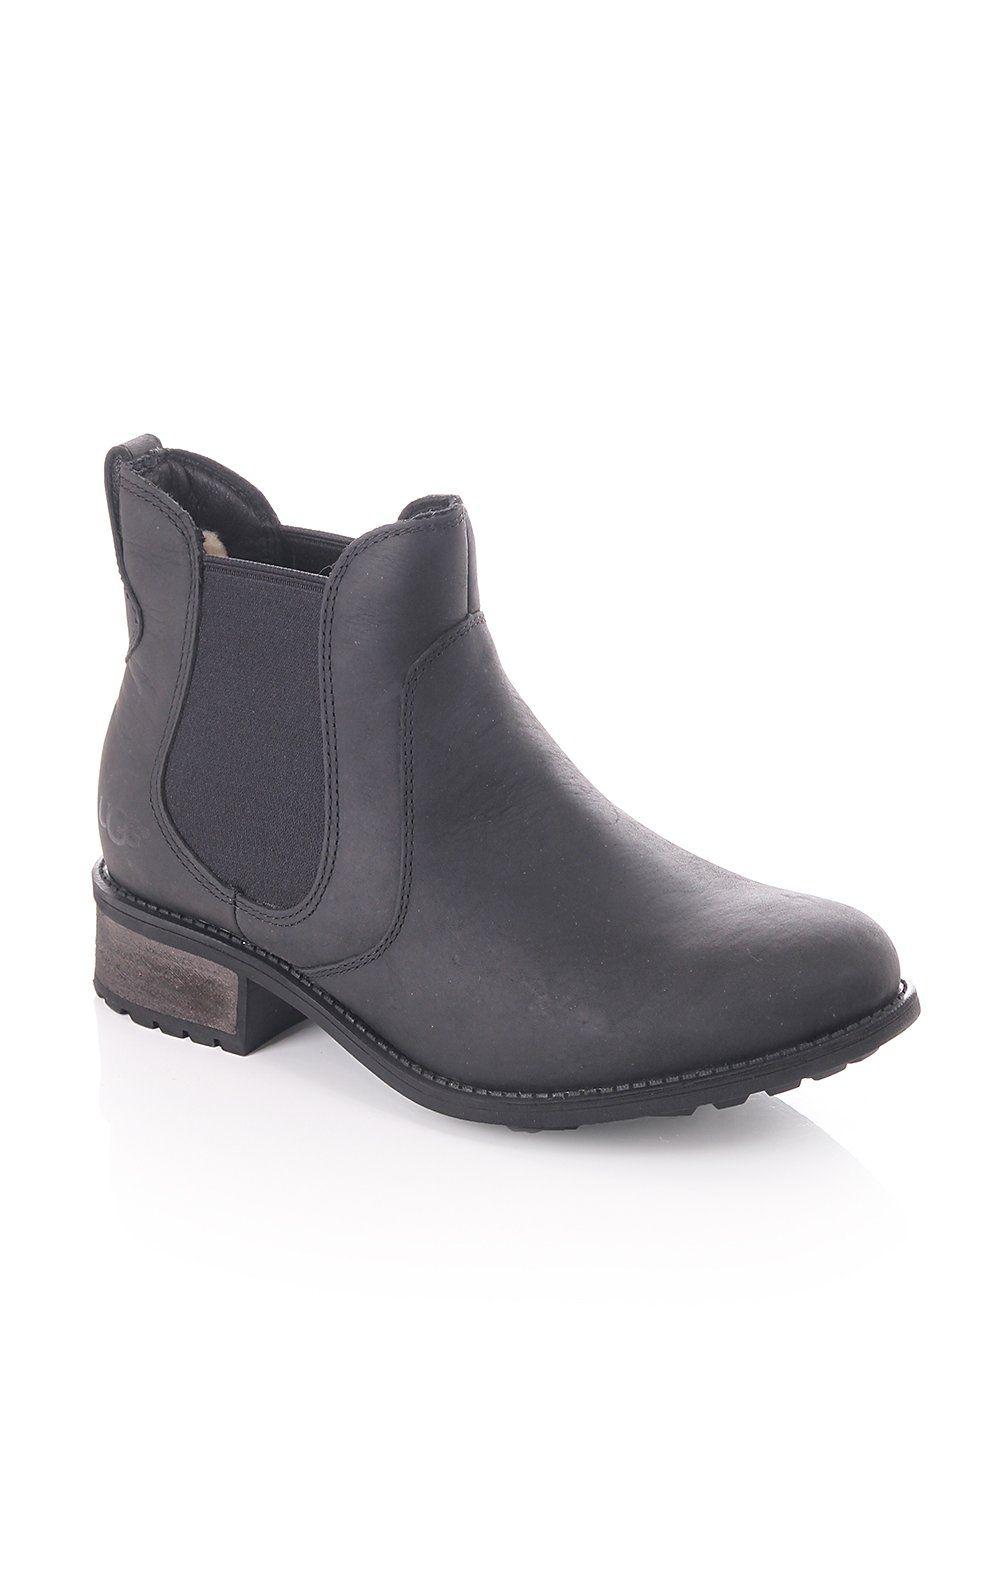 01c266d478f Ugg Australia Bonham Water resistant Ankle Boot Black | UGG AW15